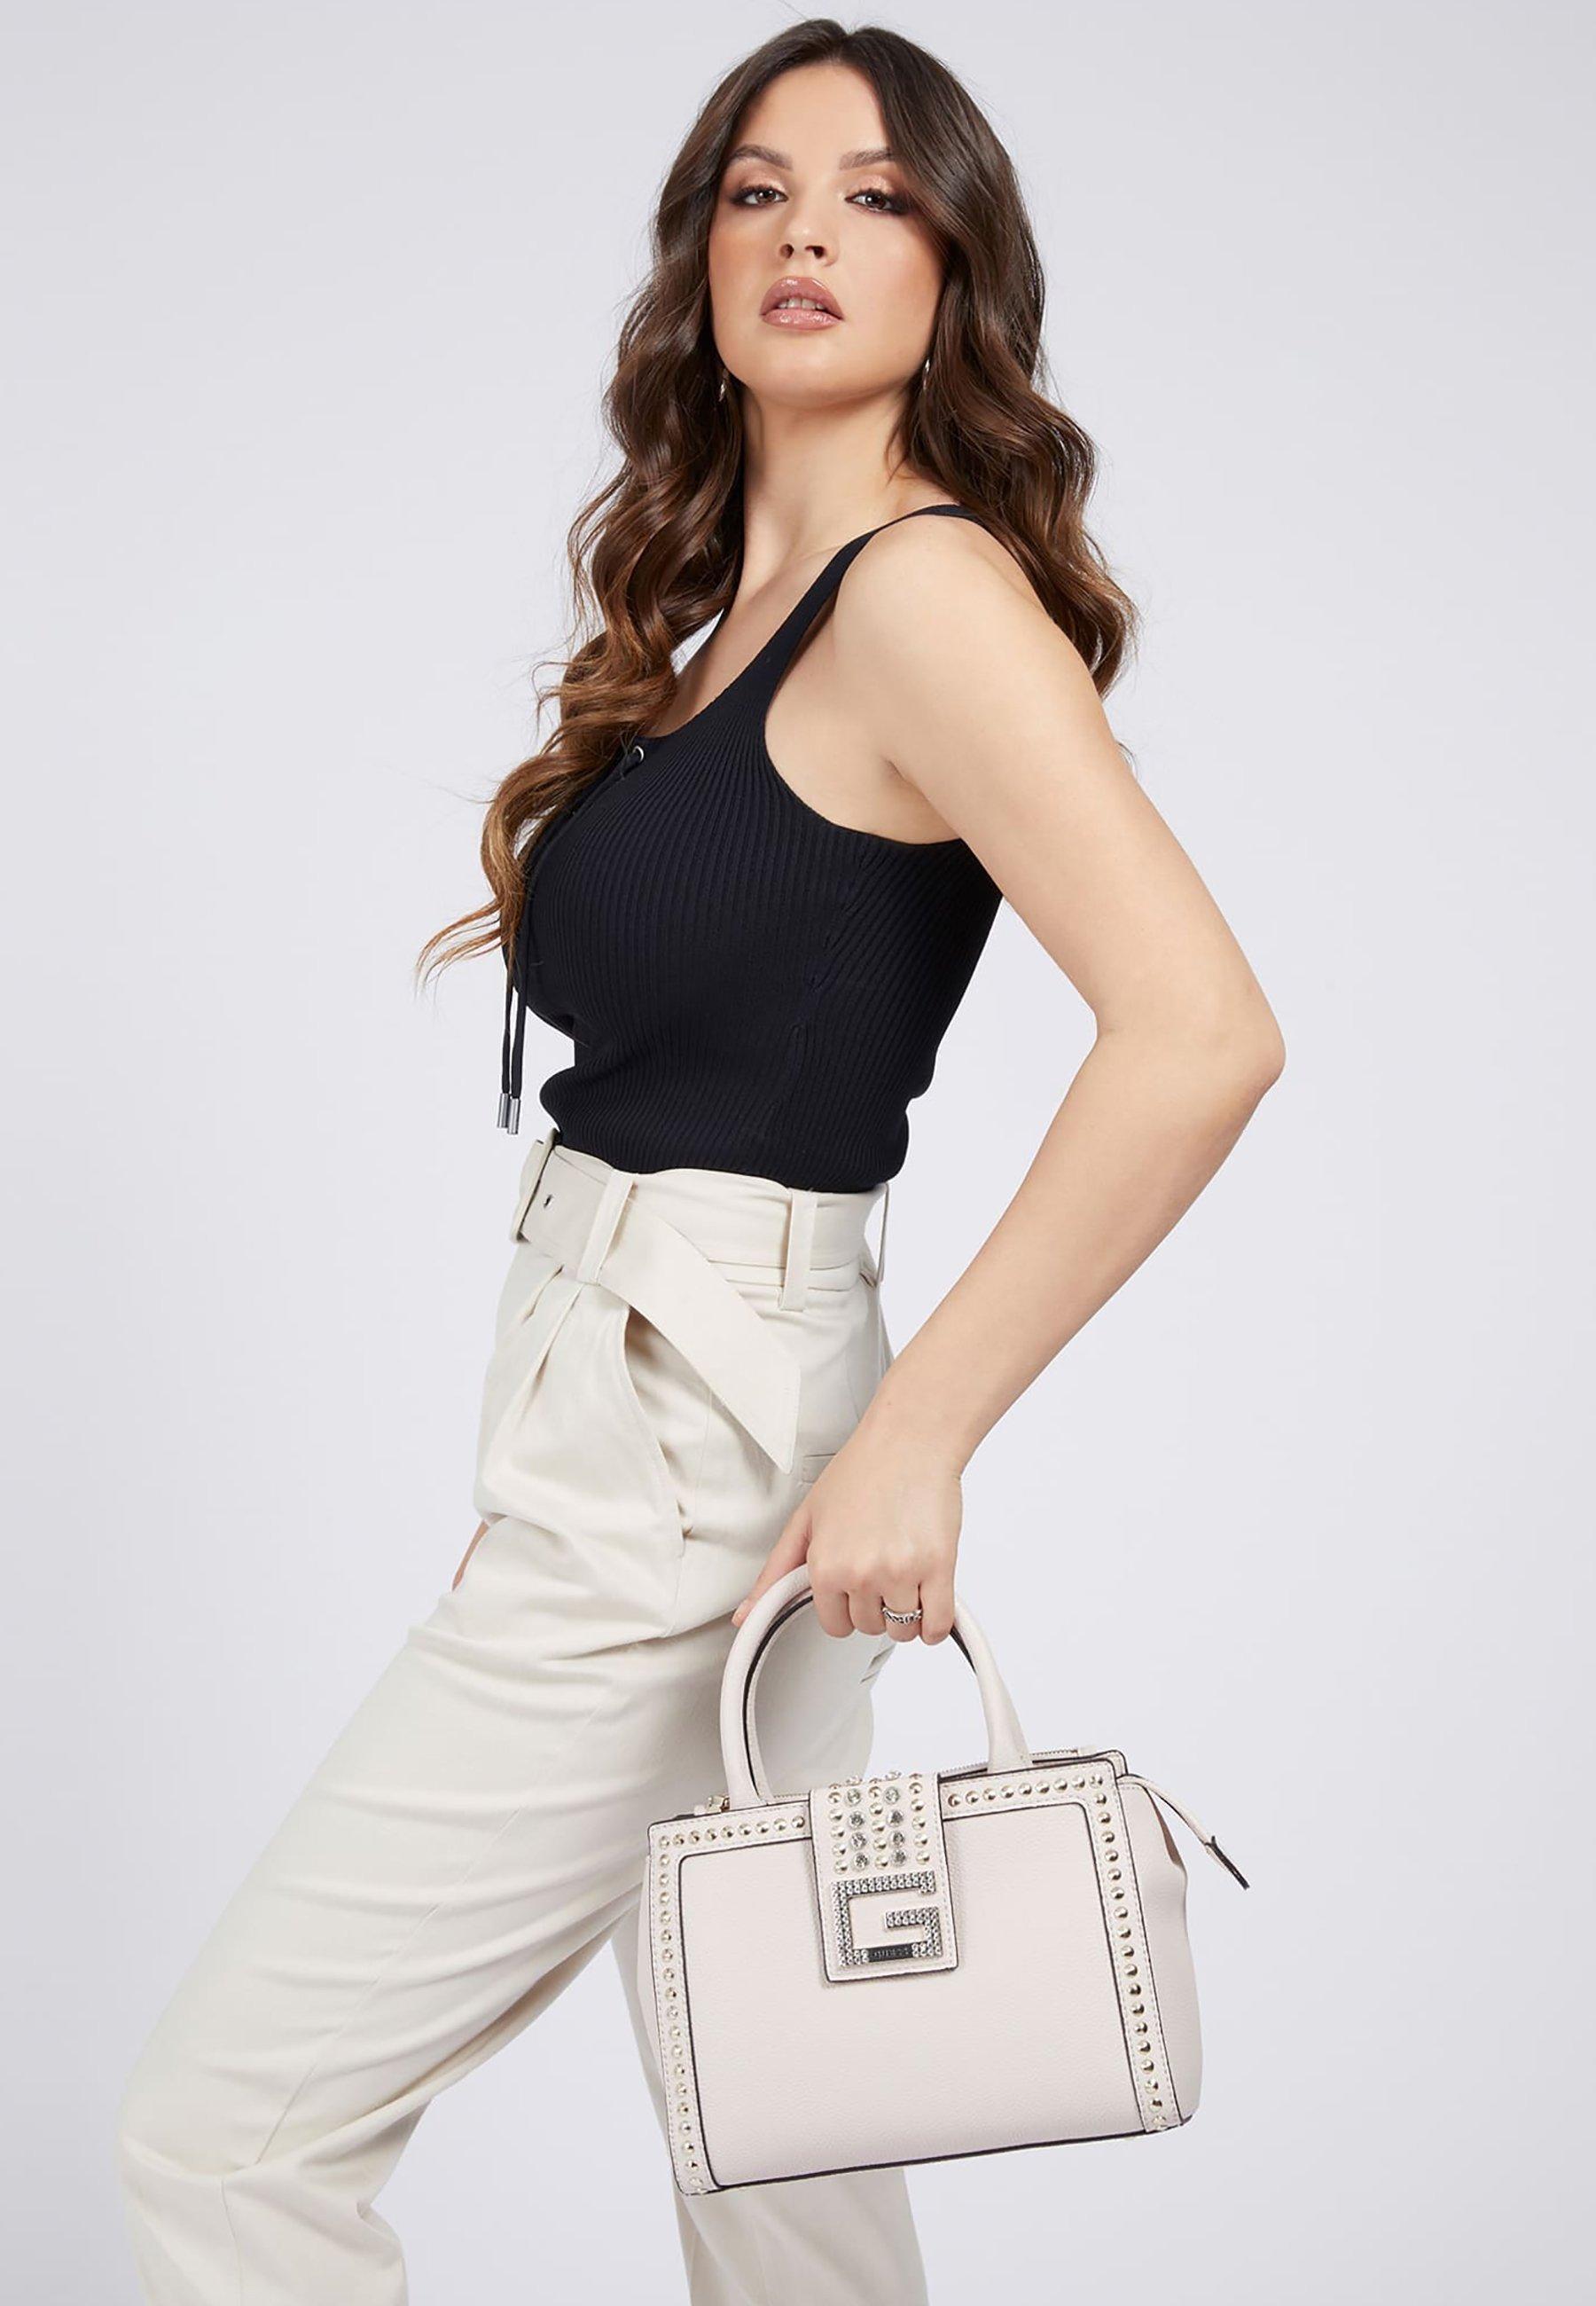 Damen BLING SOCIETY SATCHEL - Handtasche